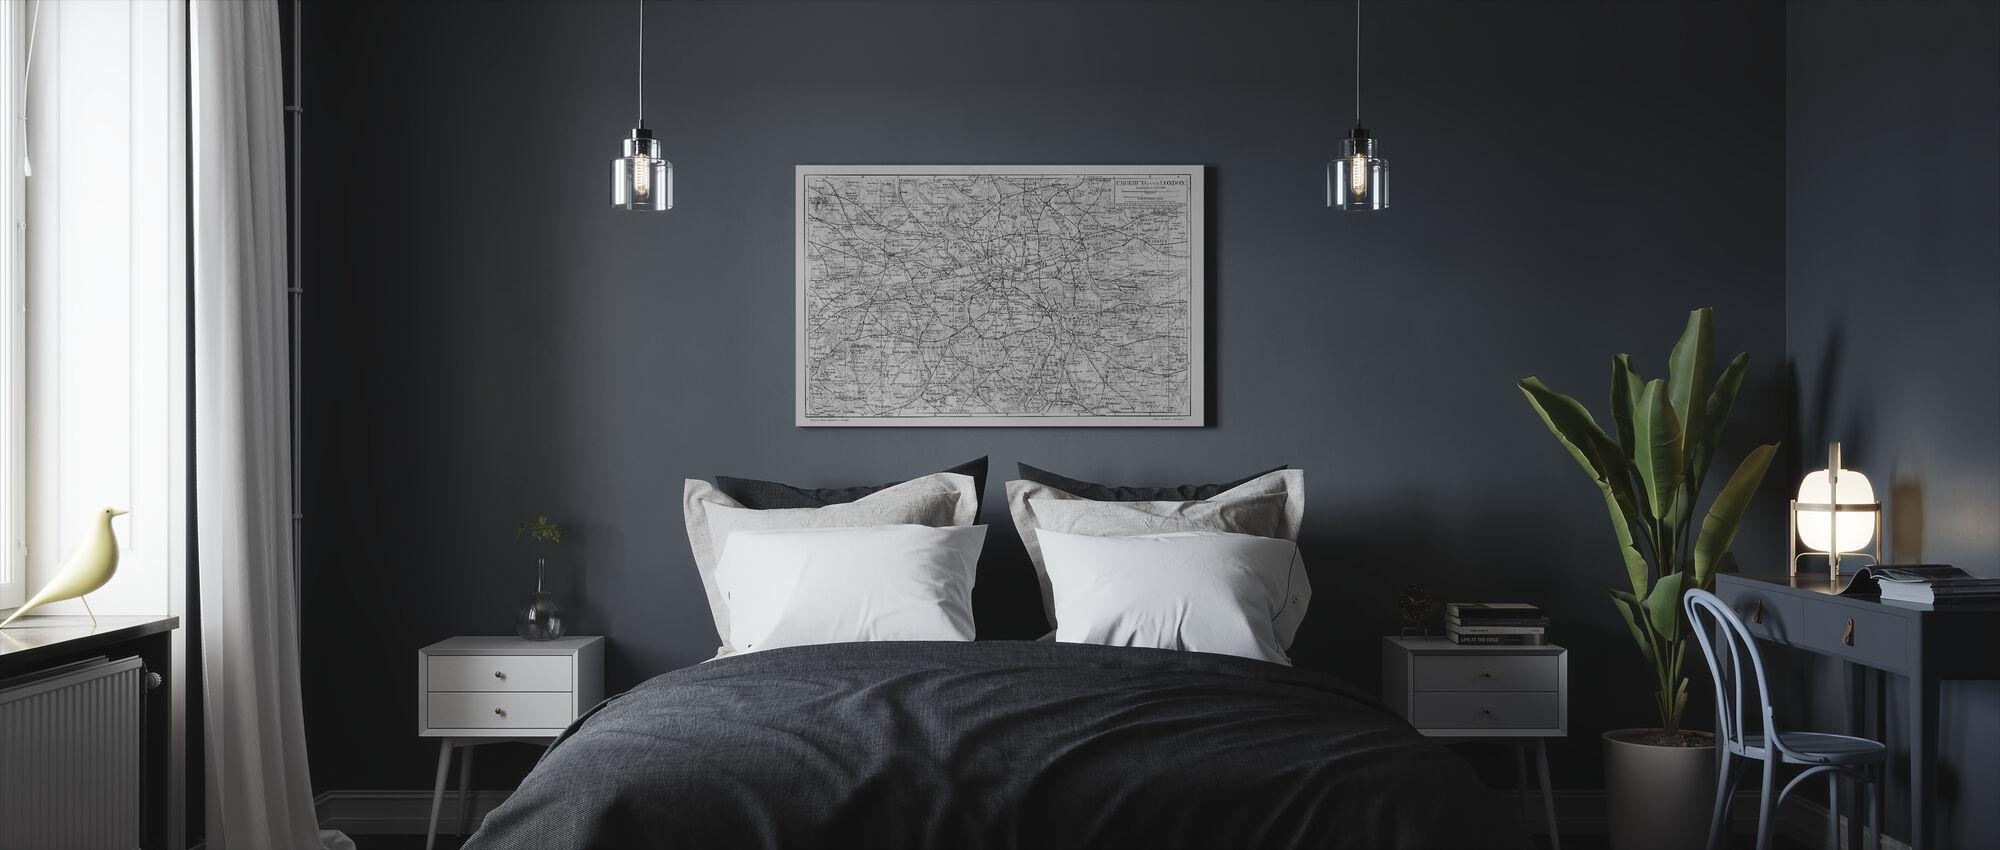 London Karta Grå - Canvastavla - Sovrum